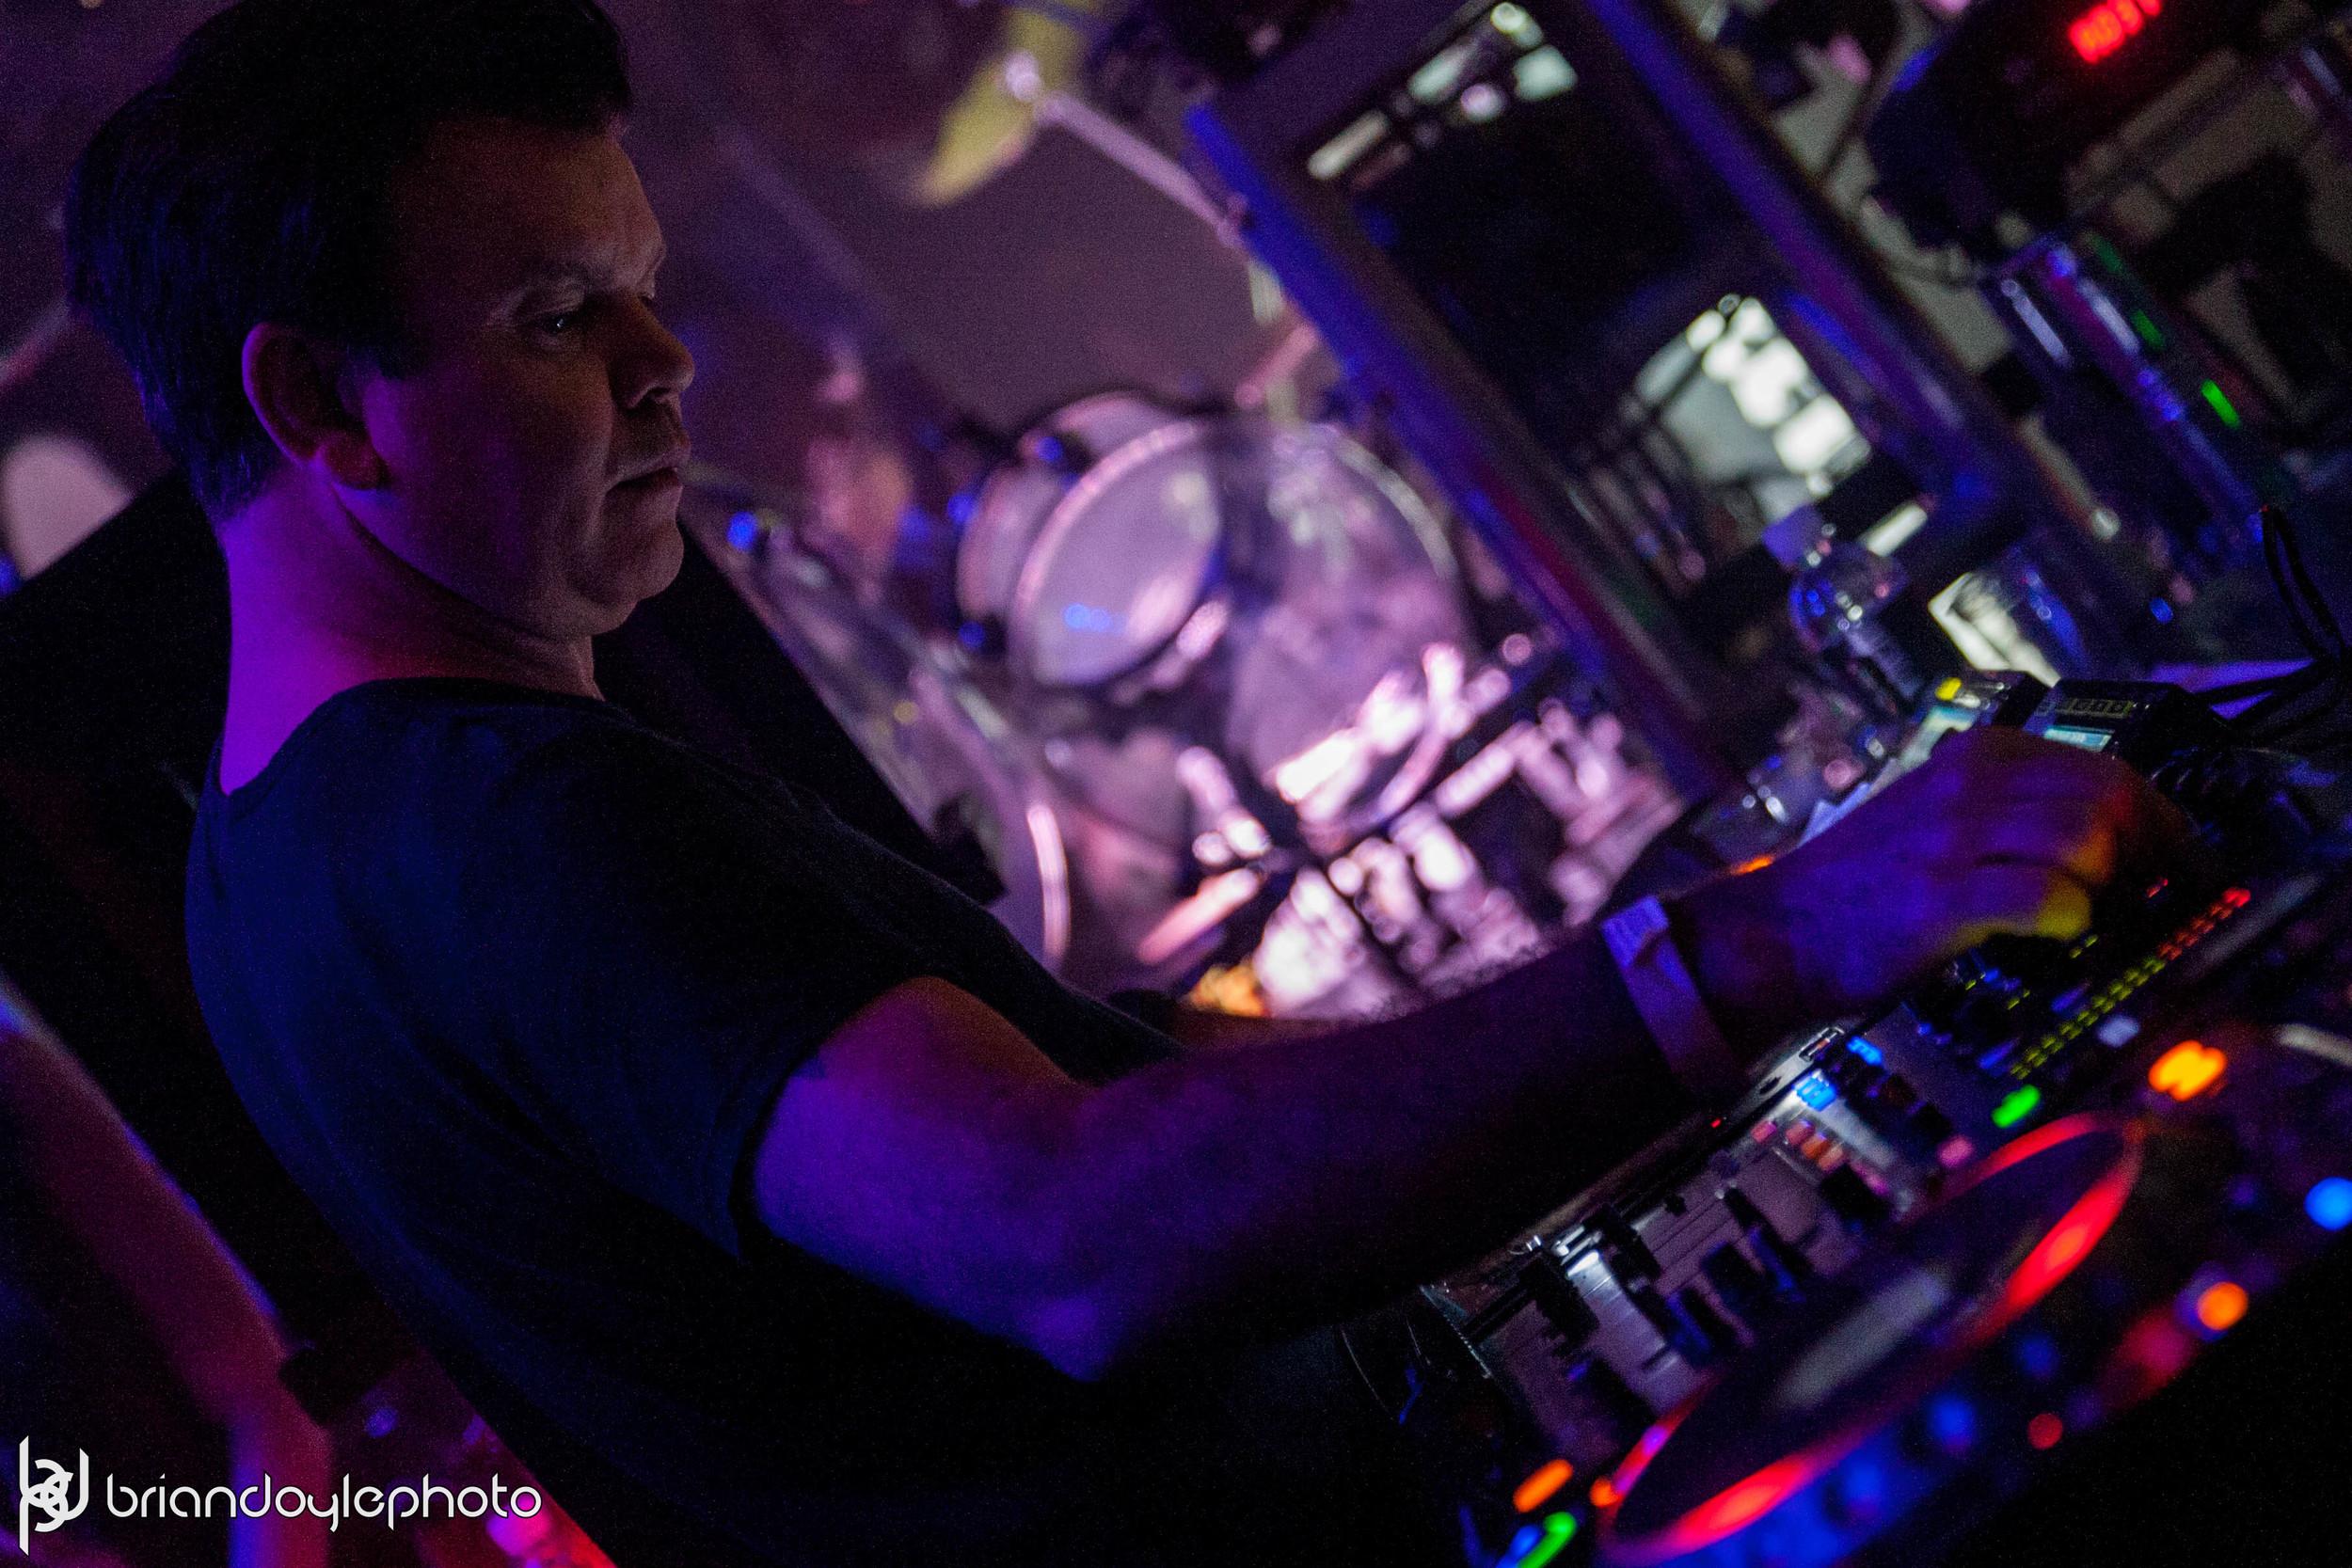 Jagermeister Presents - Paul Oakenfold @ Avalon bdp 27.09.14-47.jpg